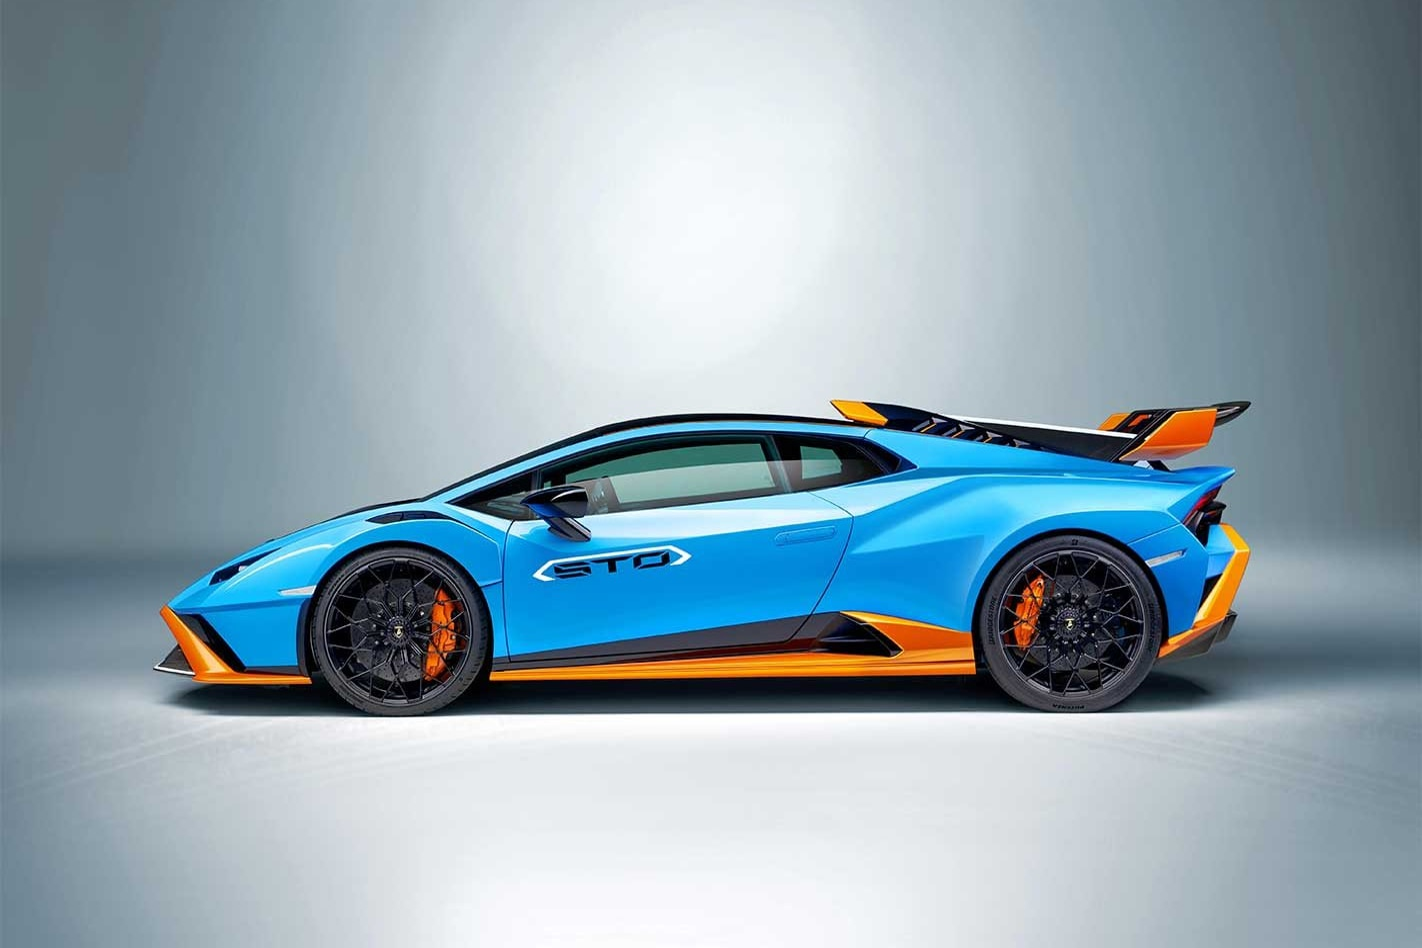 The new Lamborghini Huracan STO supercar